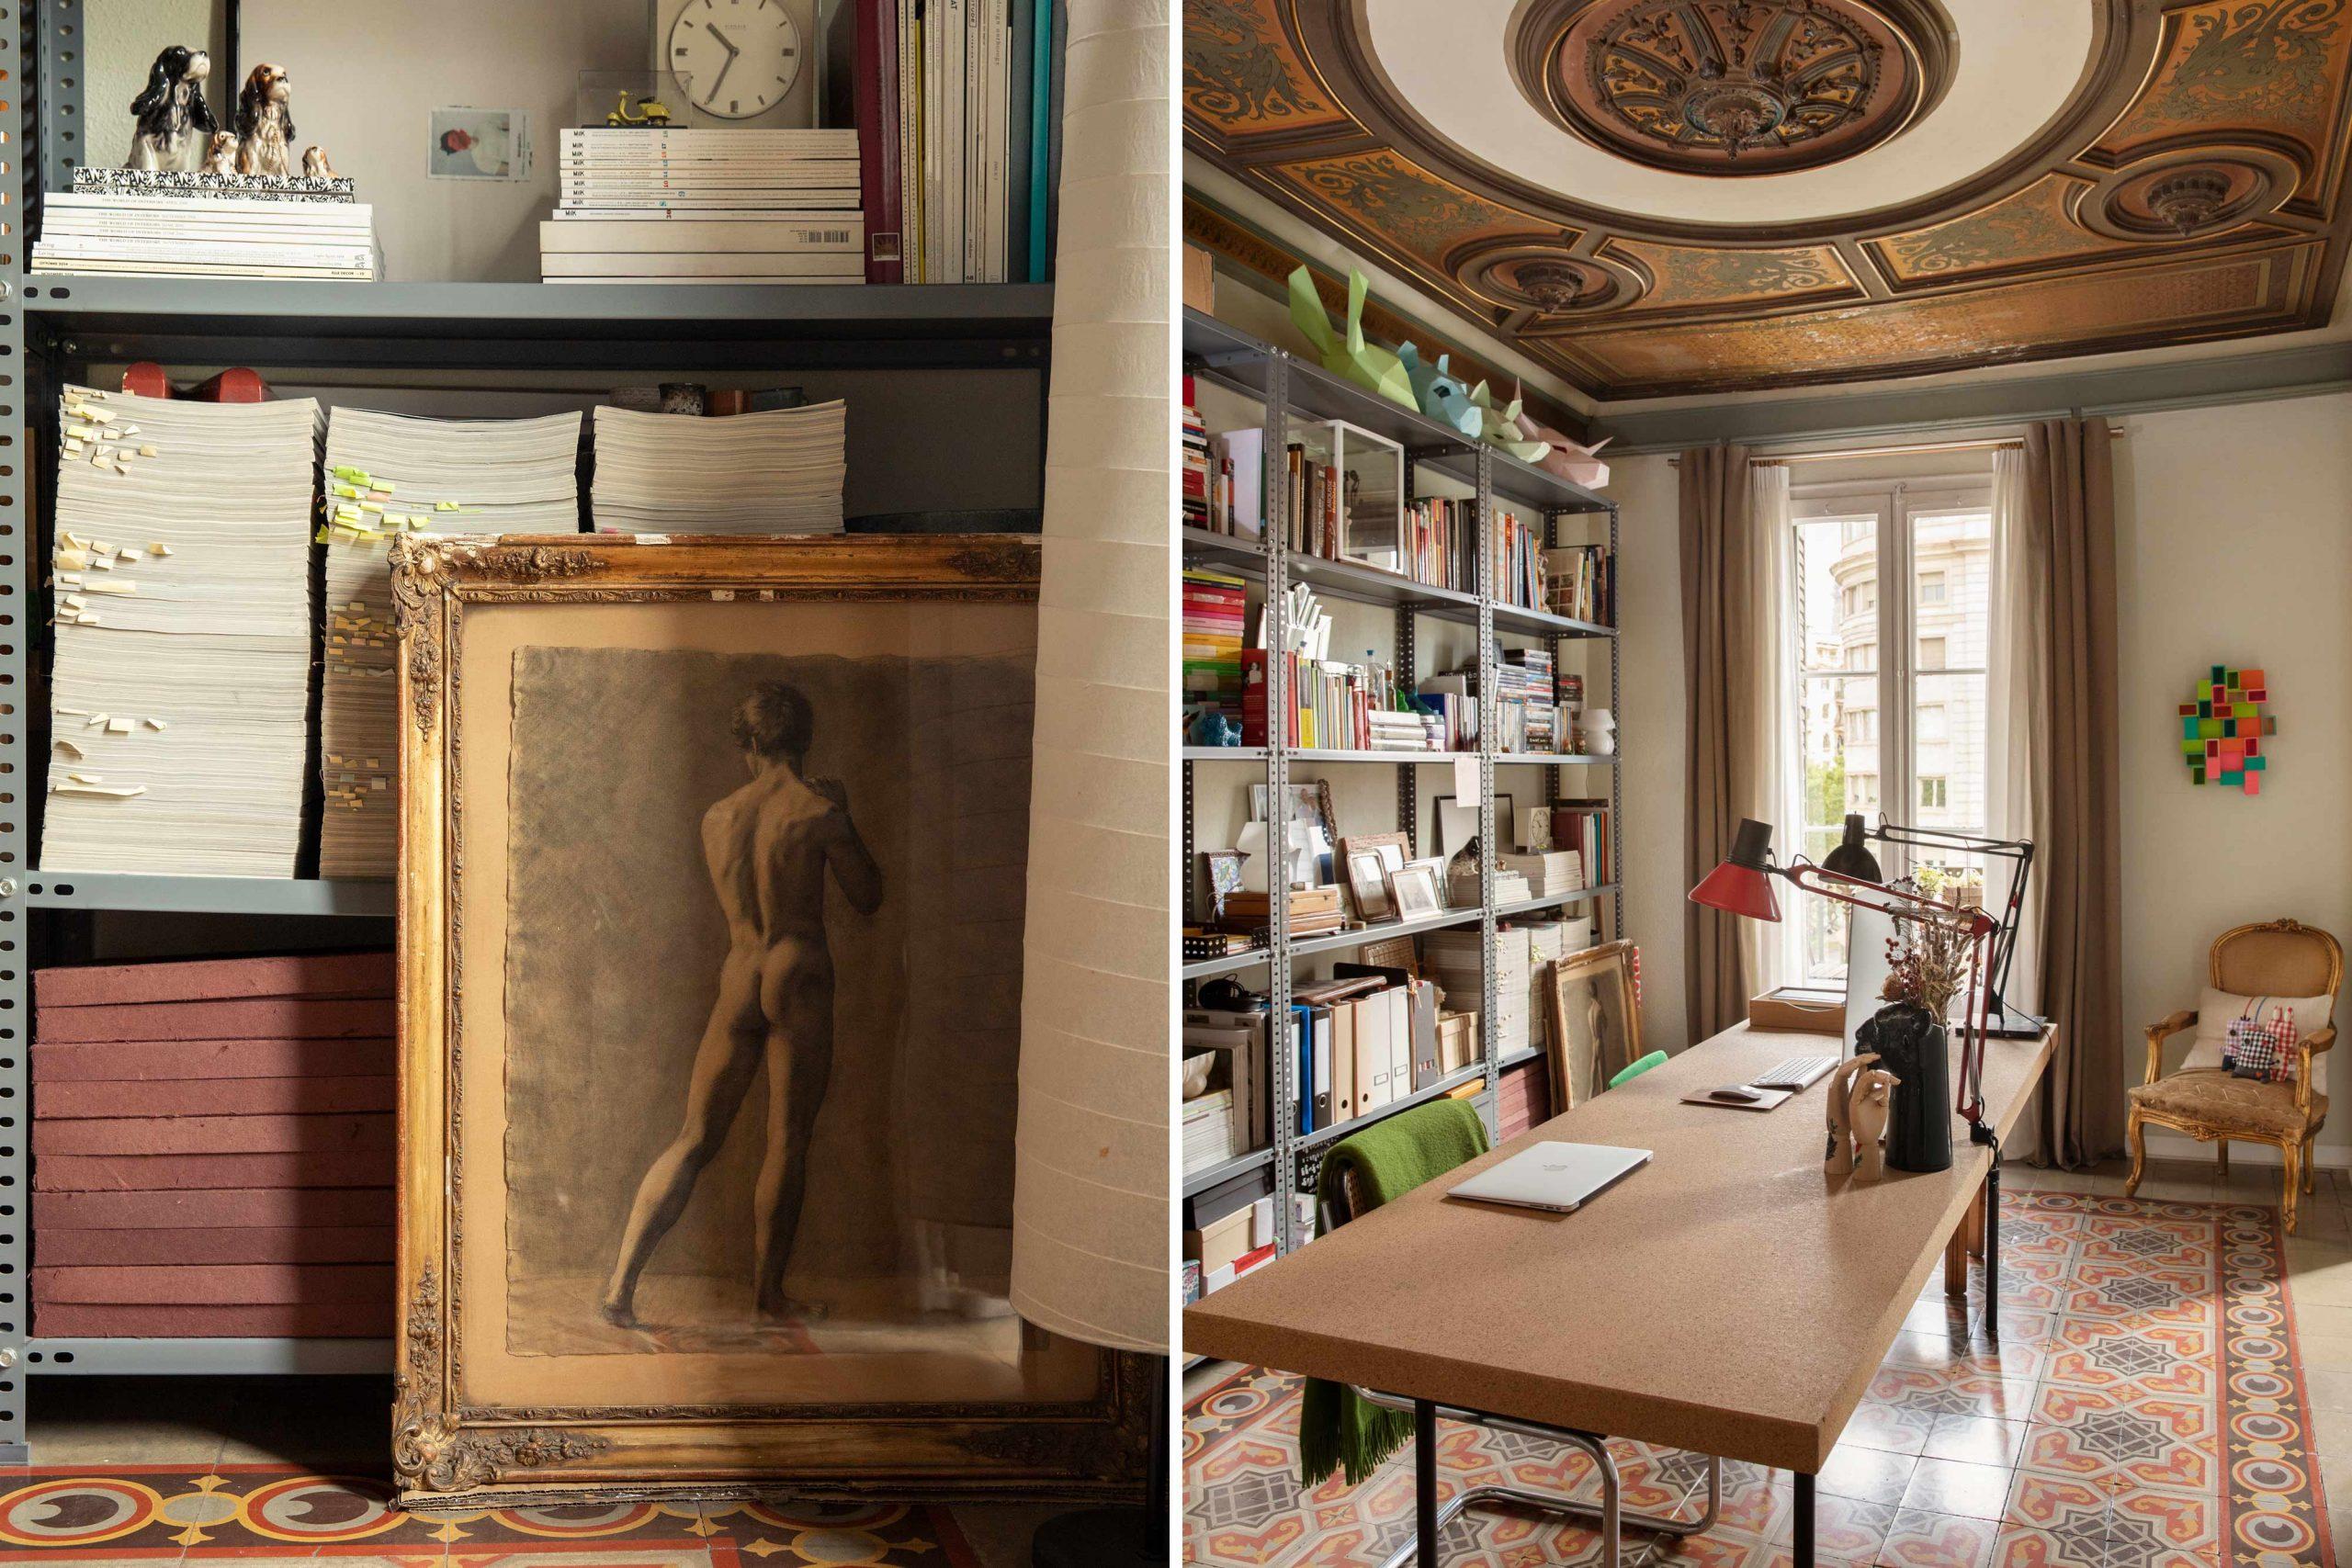 6fotografo-de-interiores-barcelona-lintrepideAD